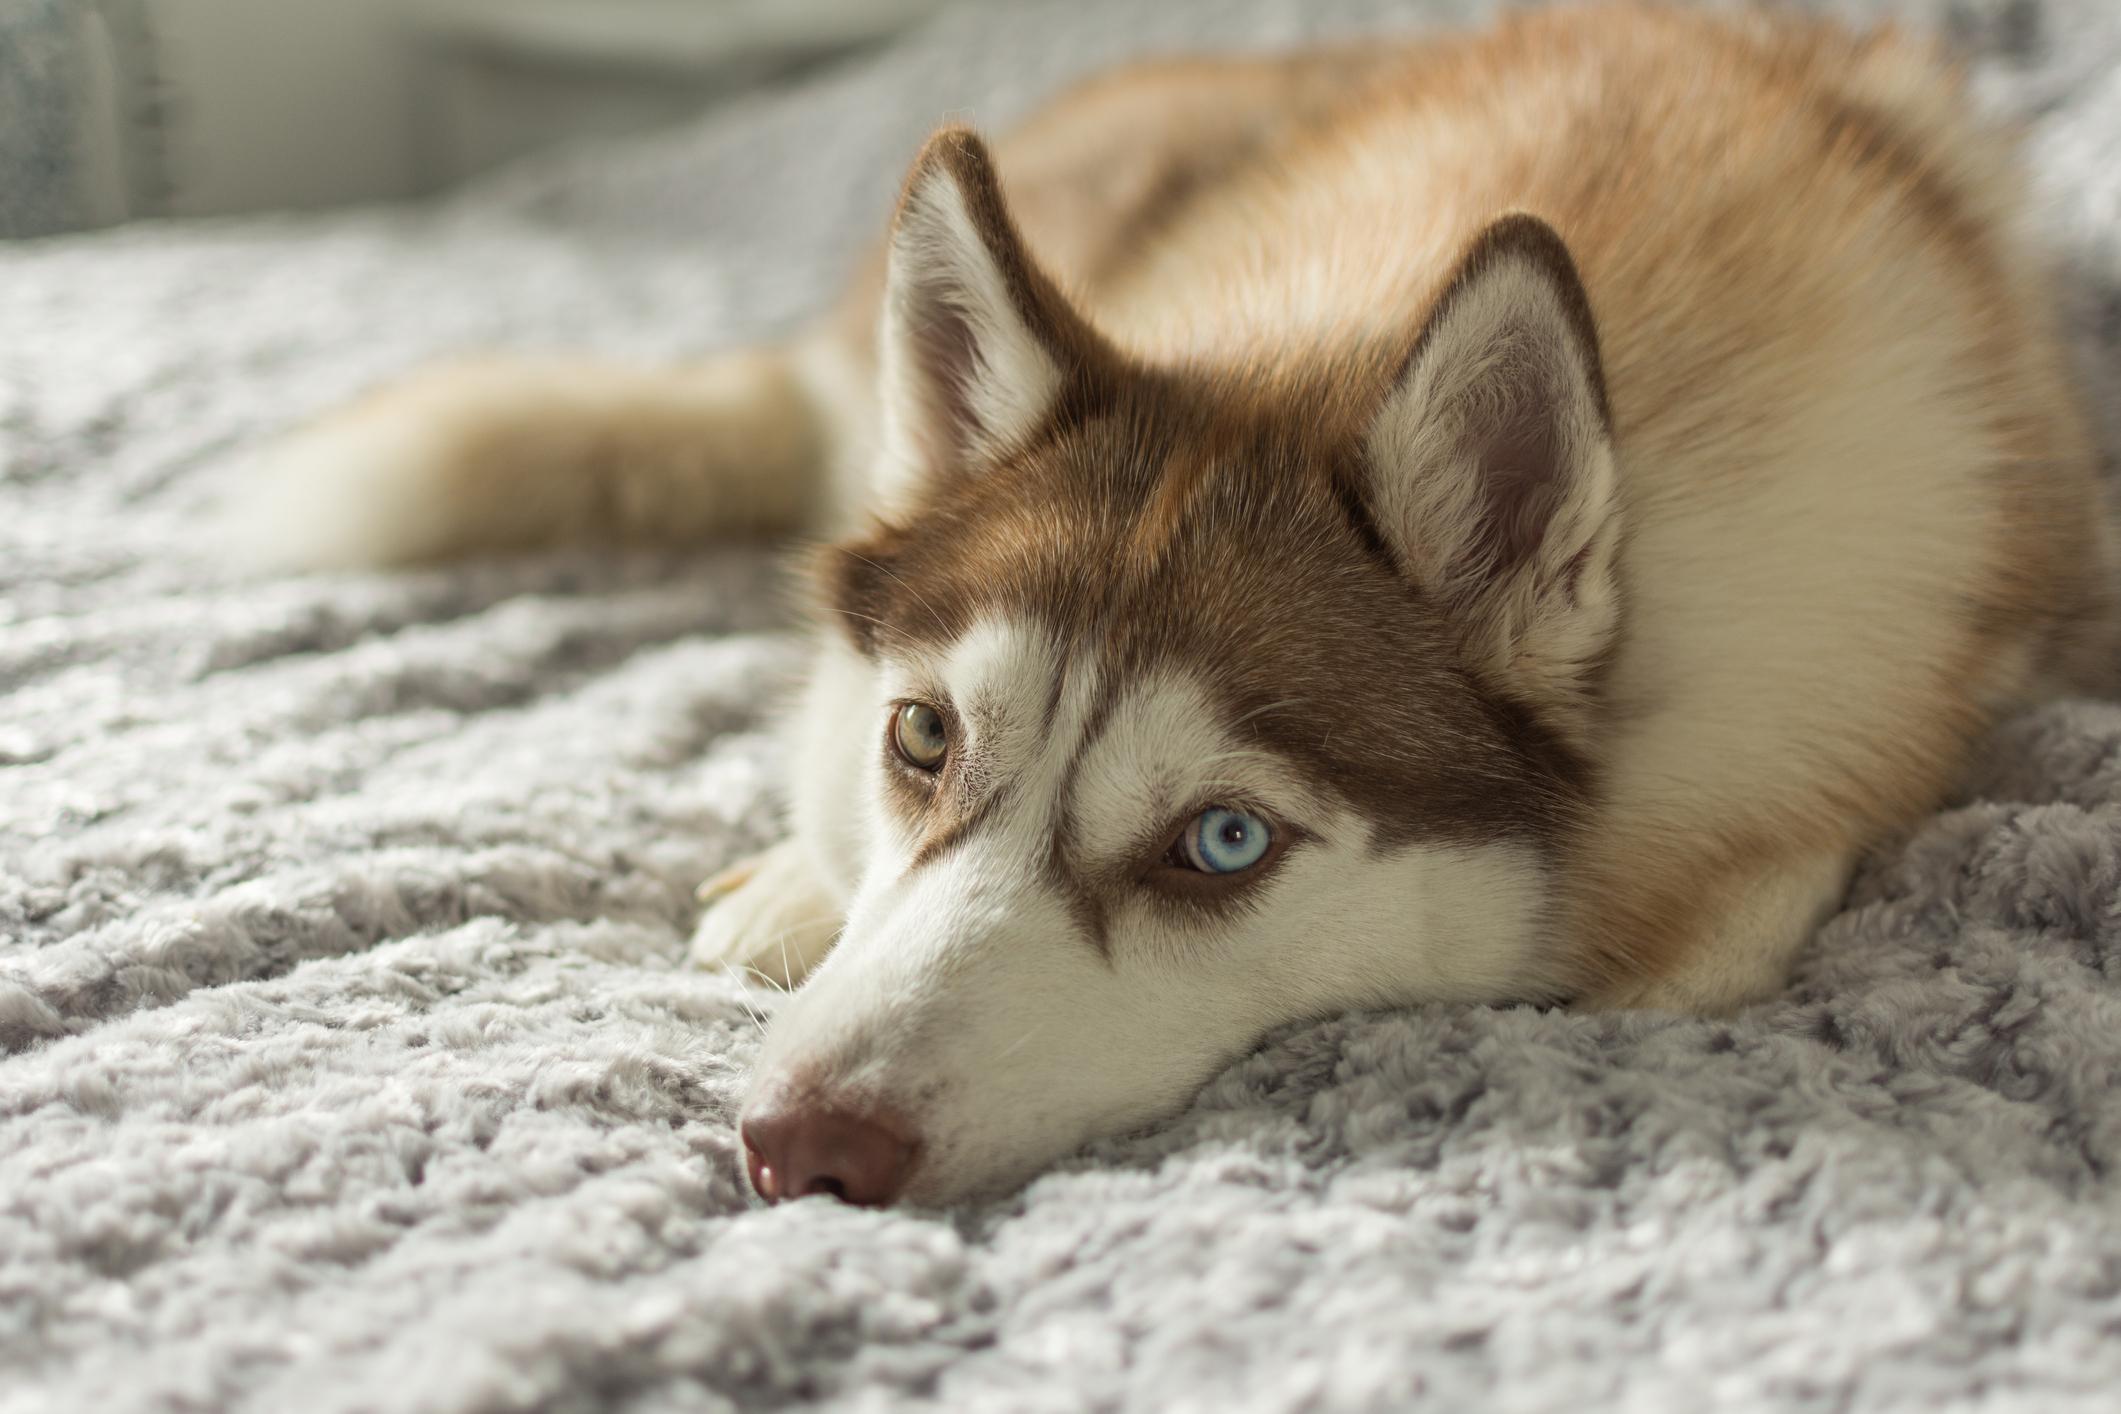 Siberian Husky at home looking at camera closeup